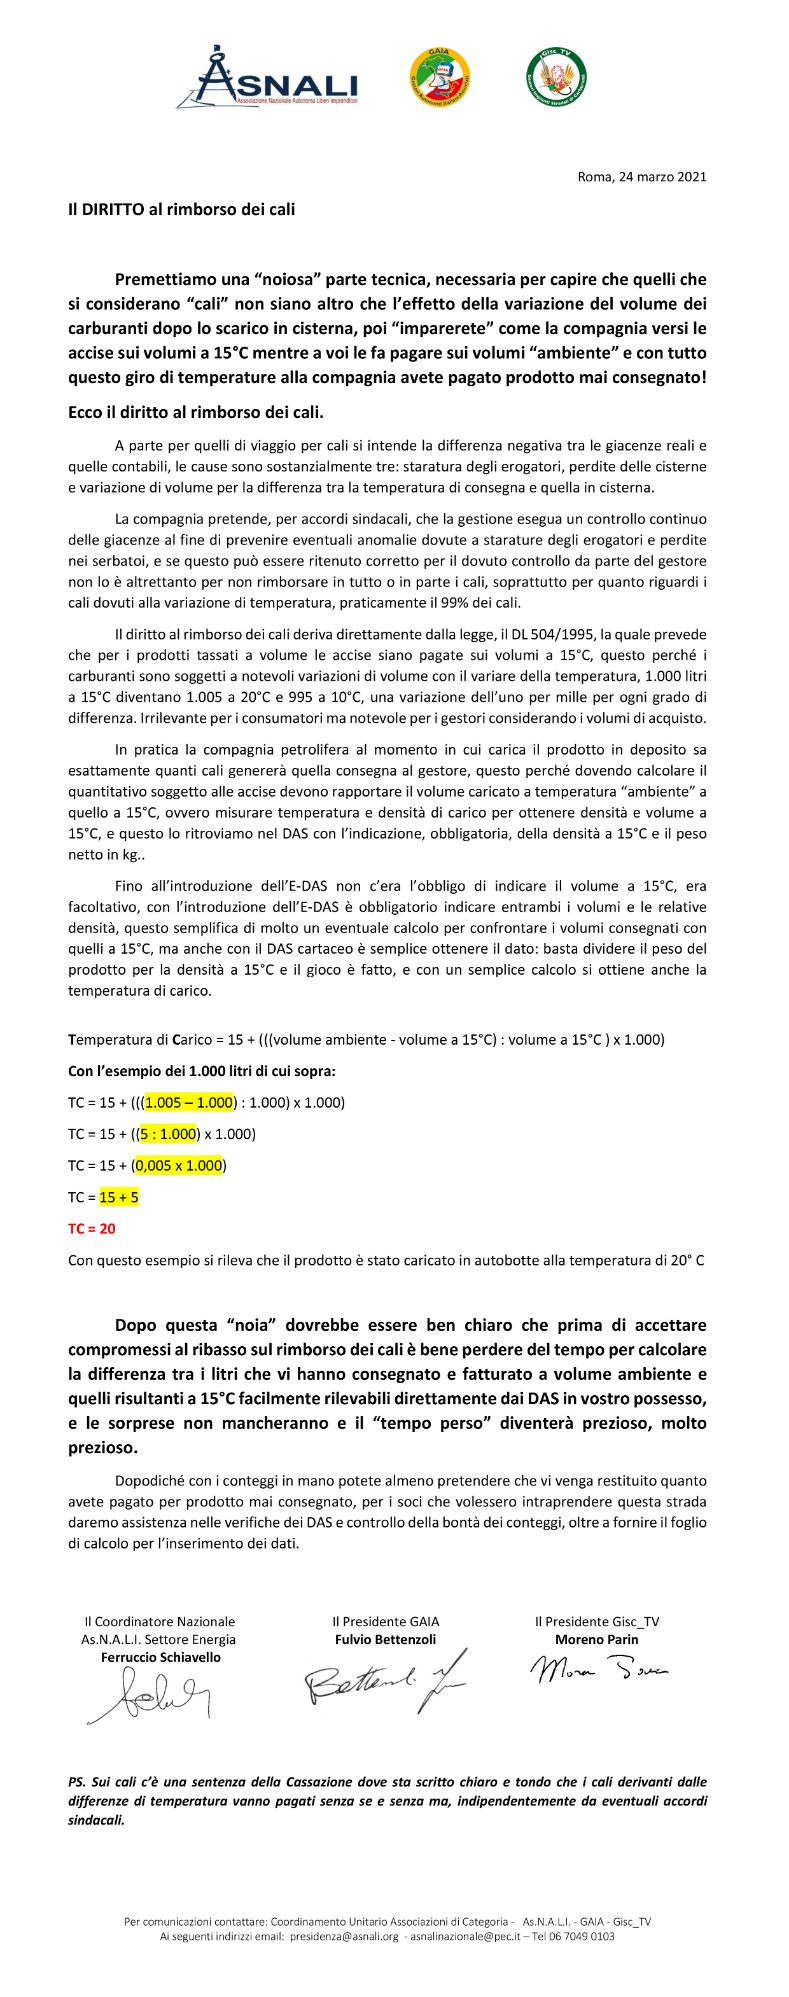 dirittoaicali24-03-2021completo-1616601026.jpg